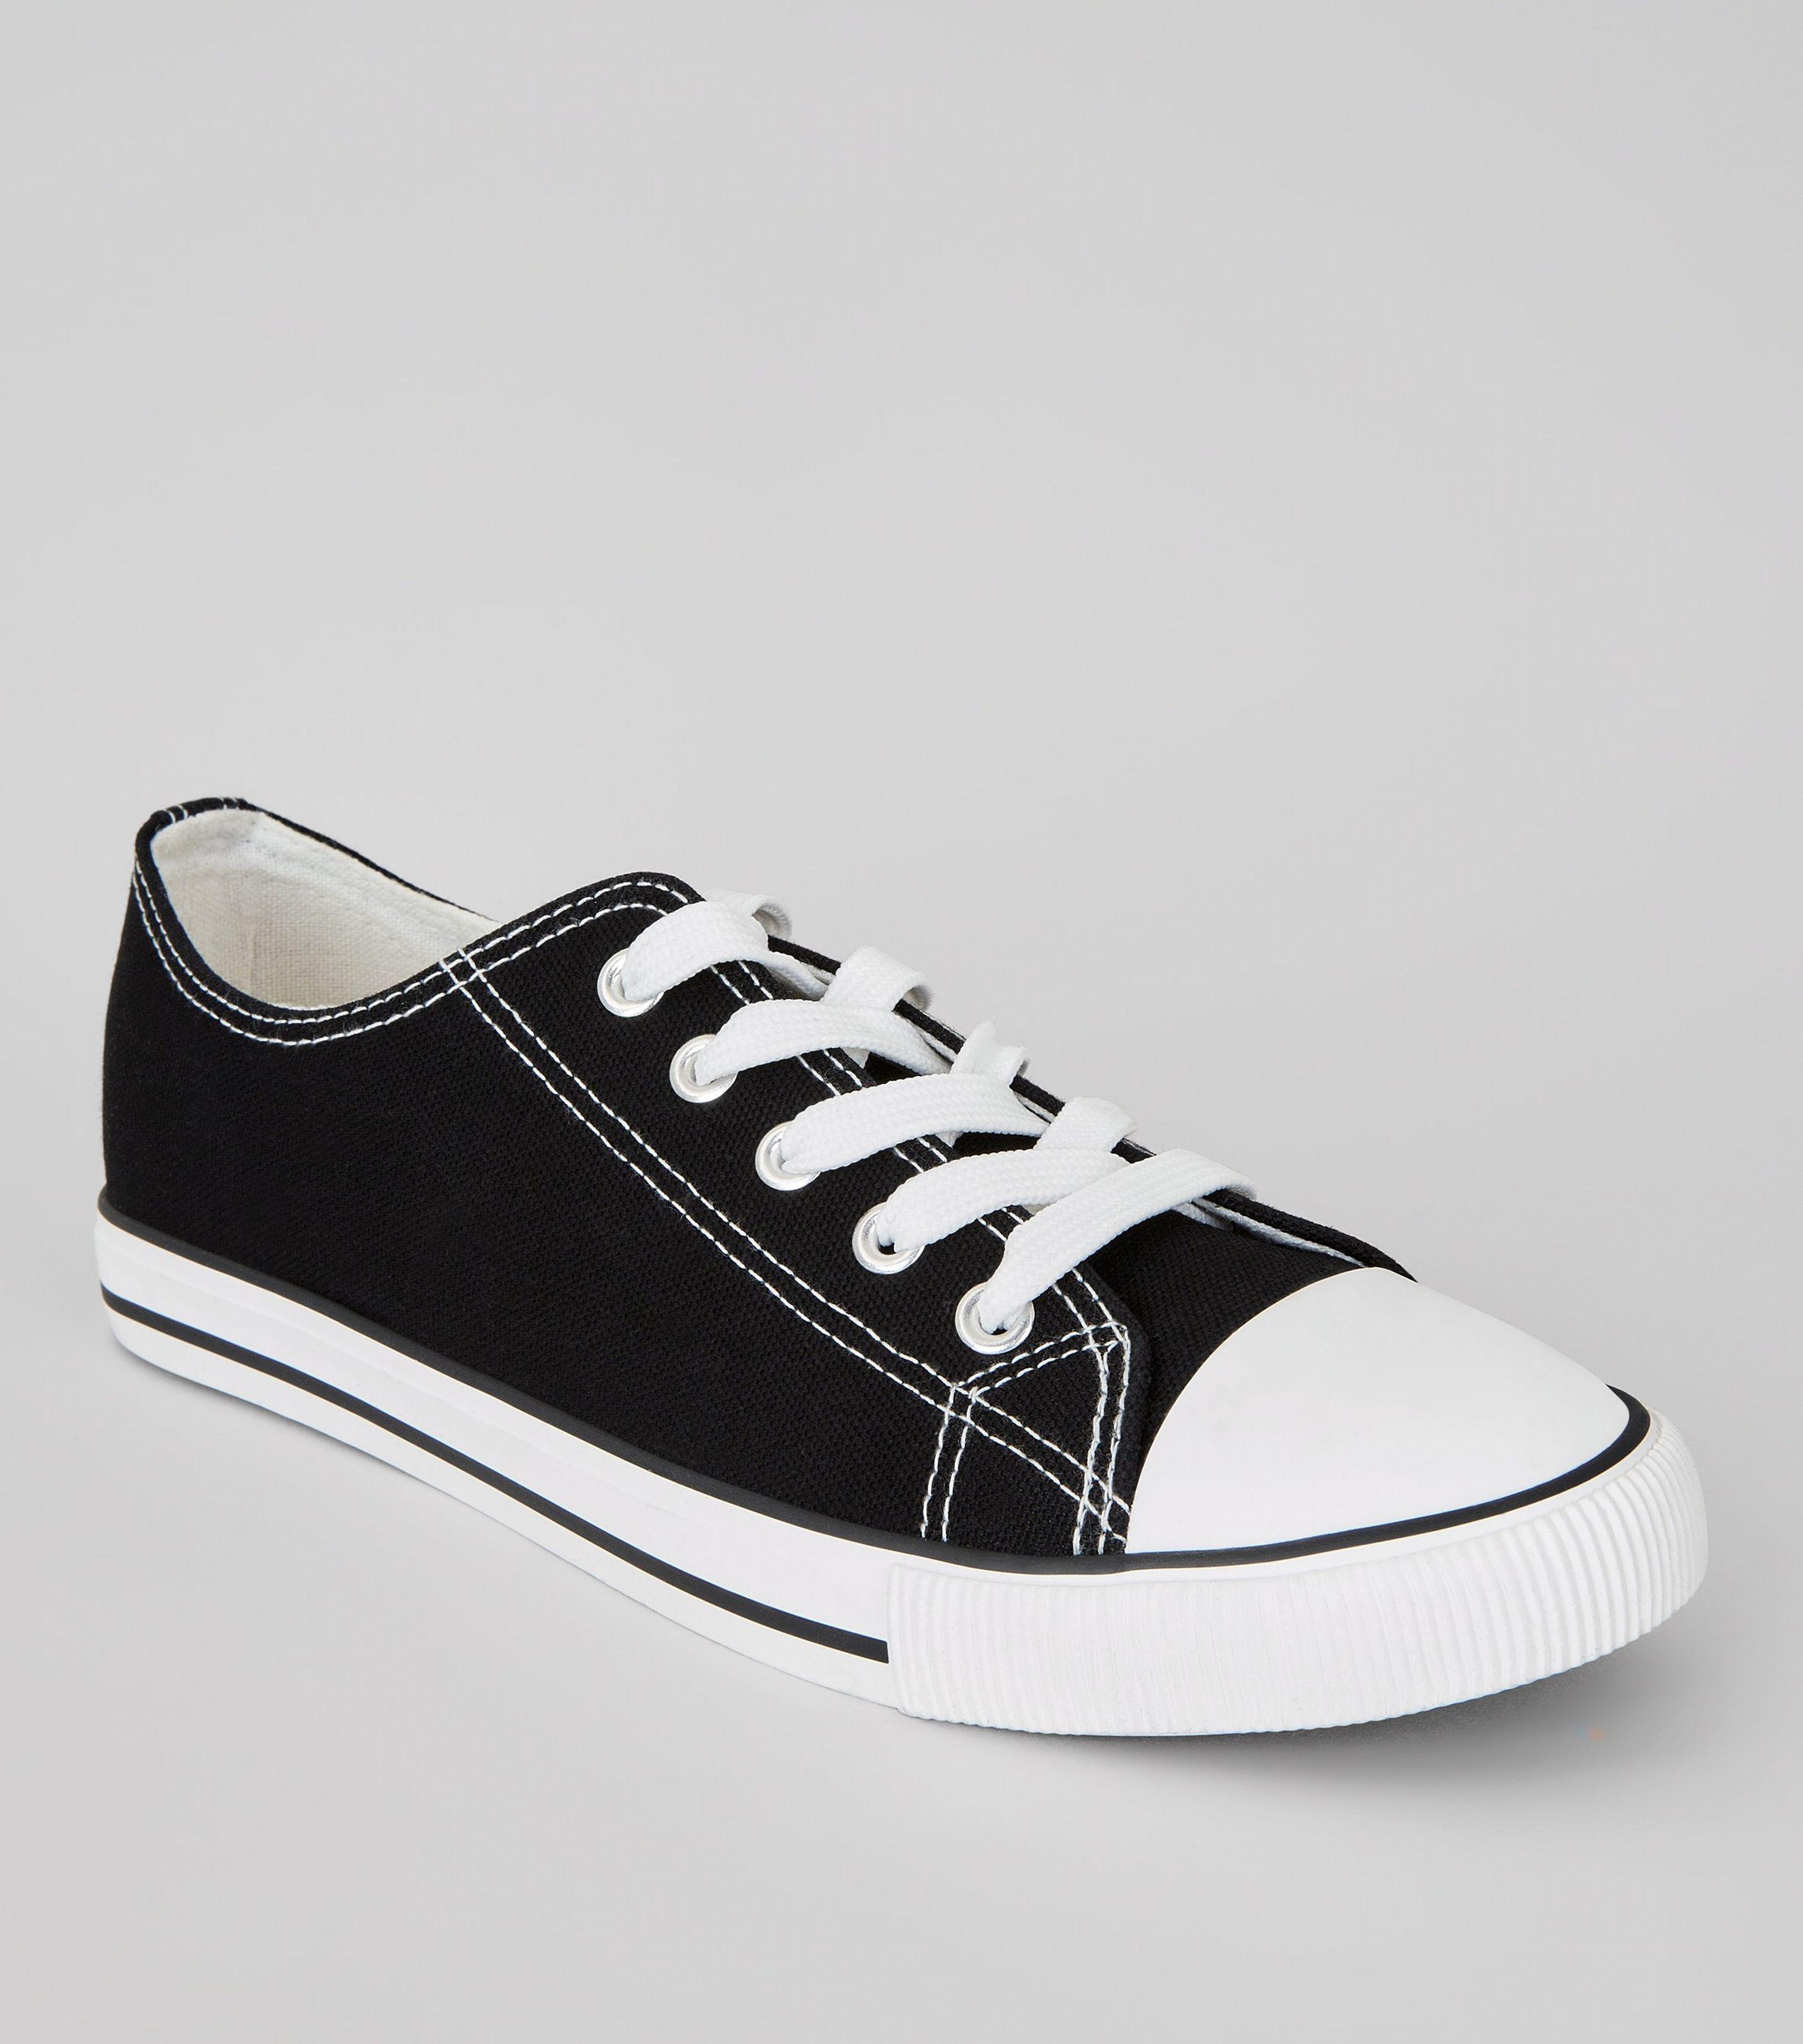 0f7cbd4e60a5 New Look Black Canvas Stripe Sole Trainers in Black - Lyst